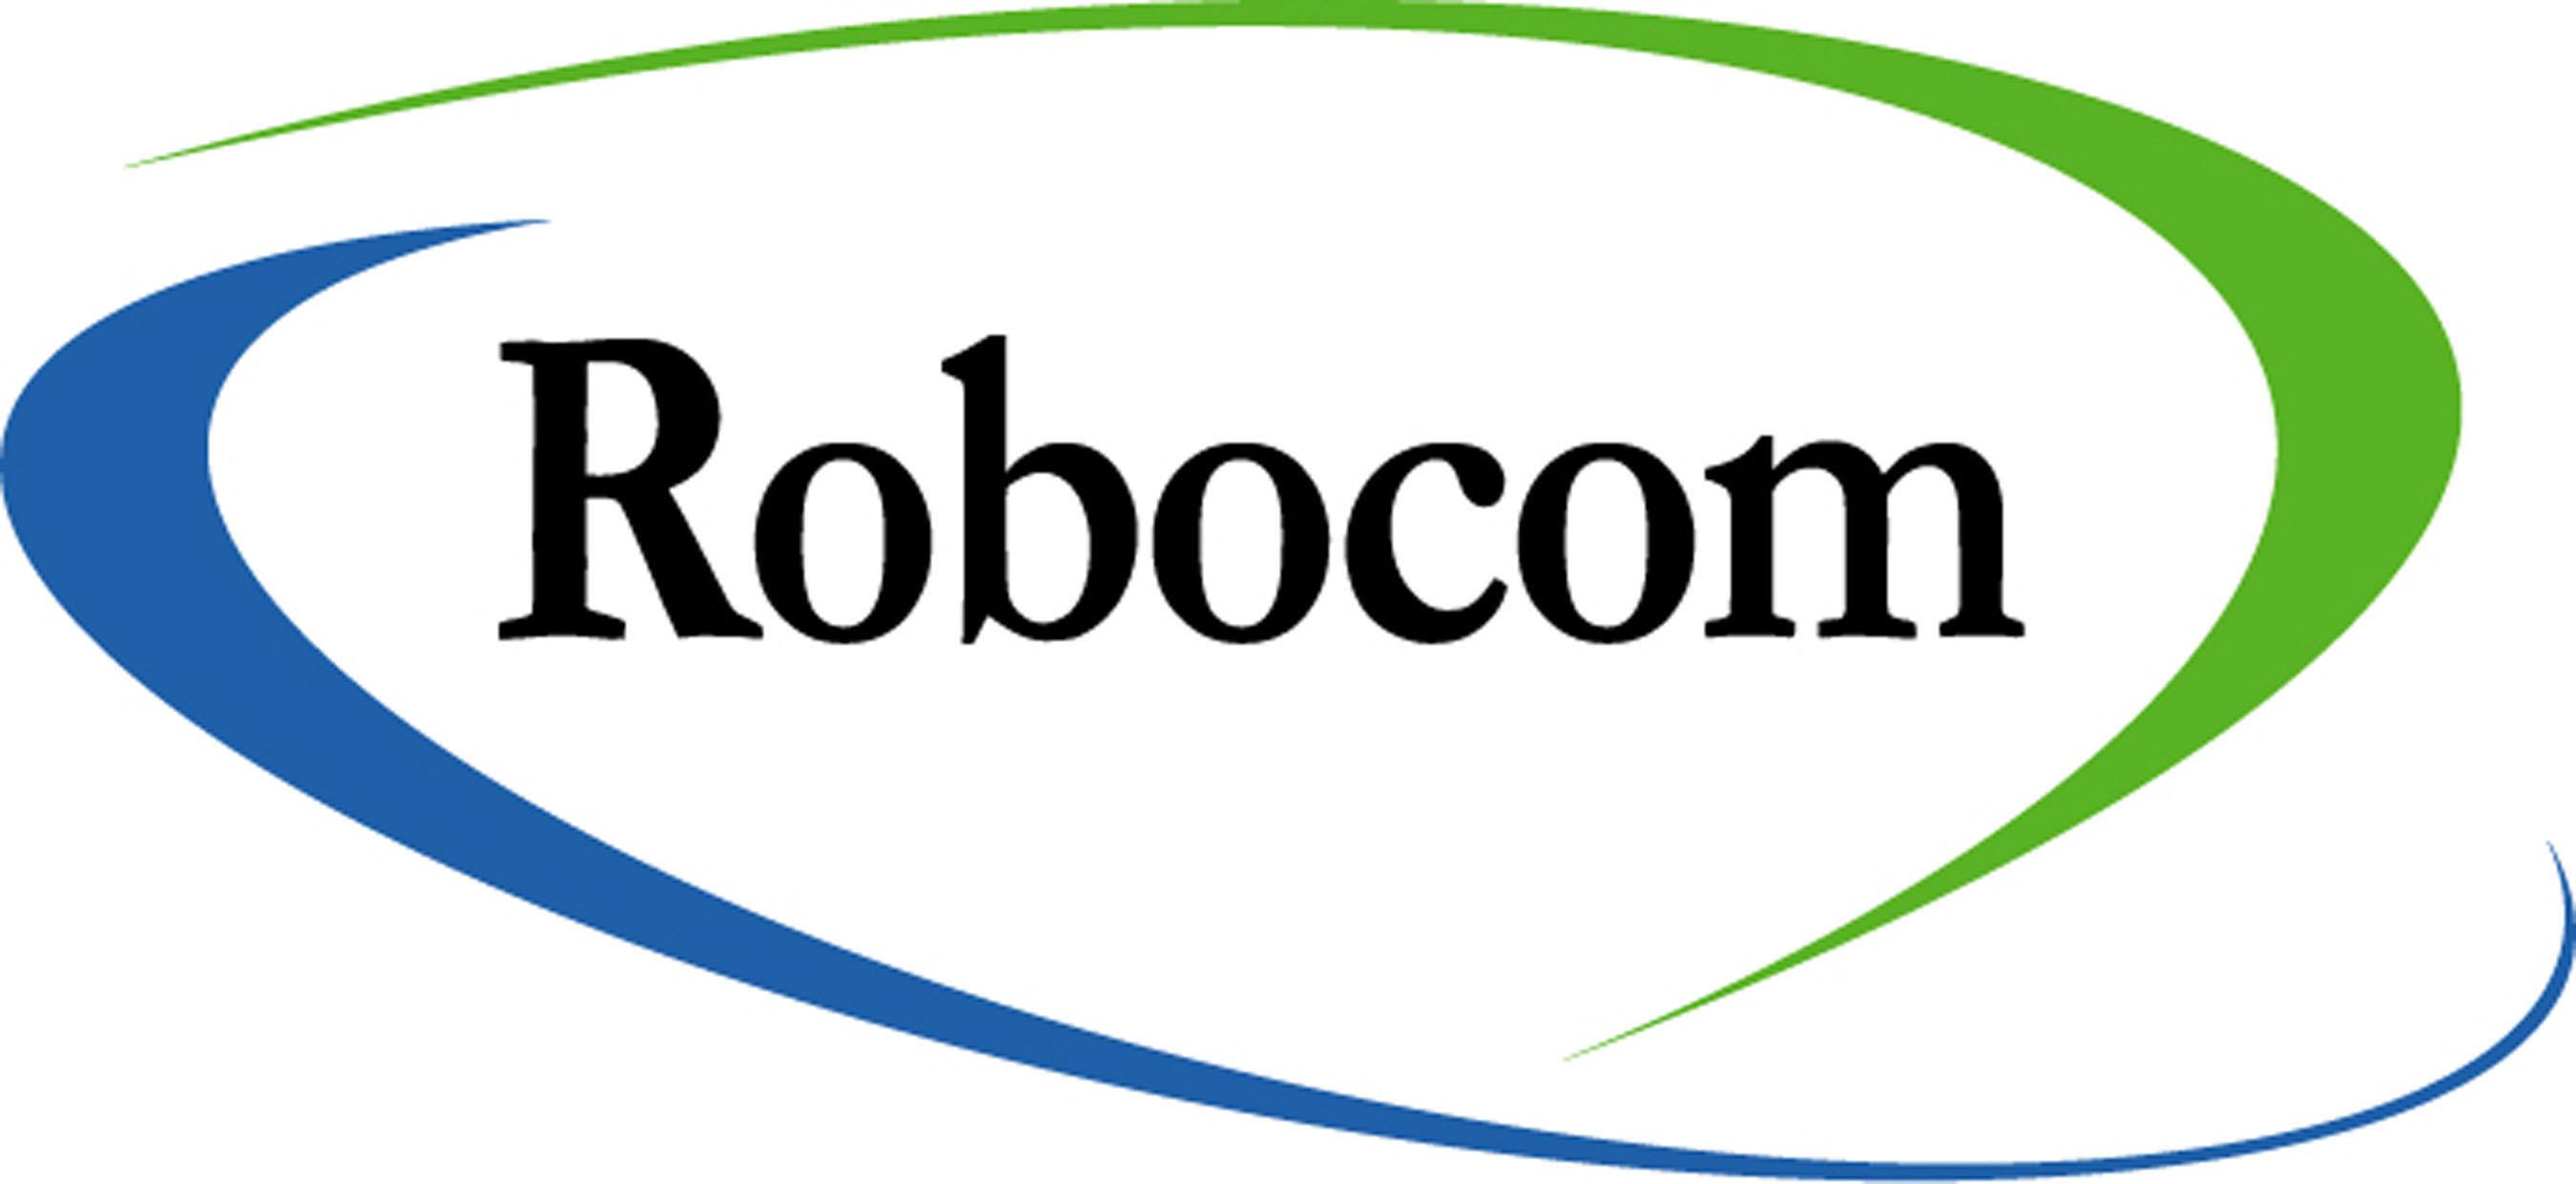 Robocom Supply Chain Software.